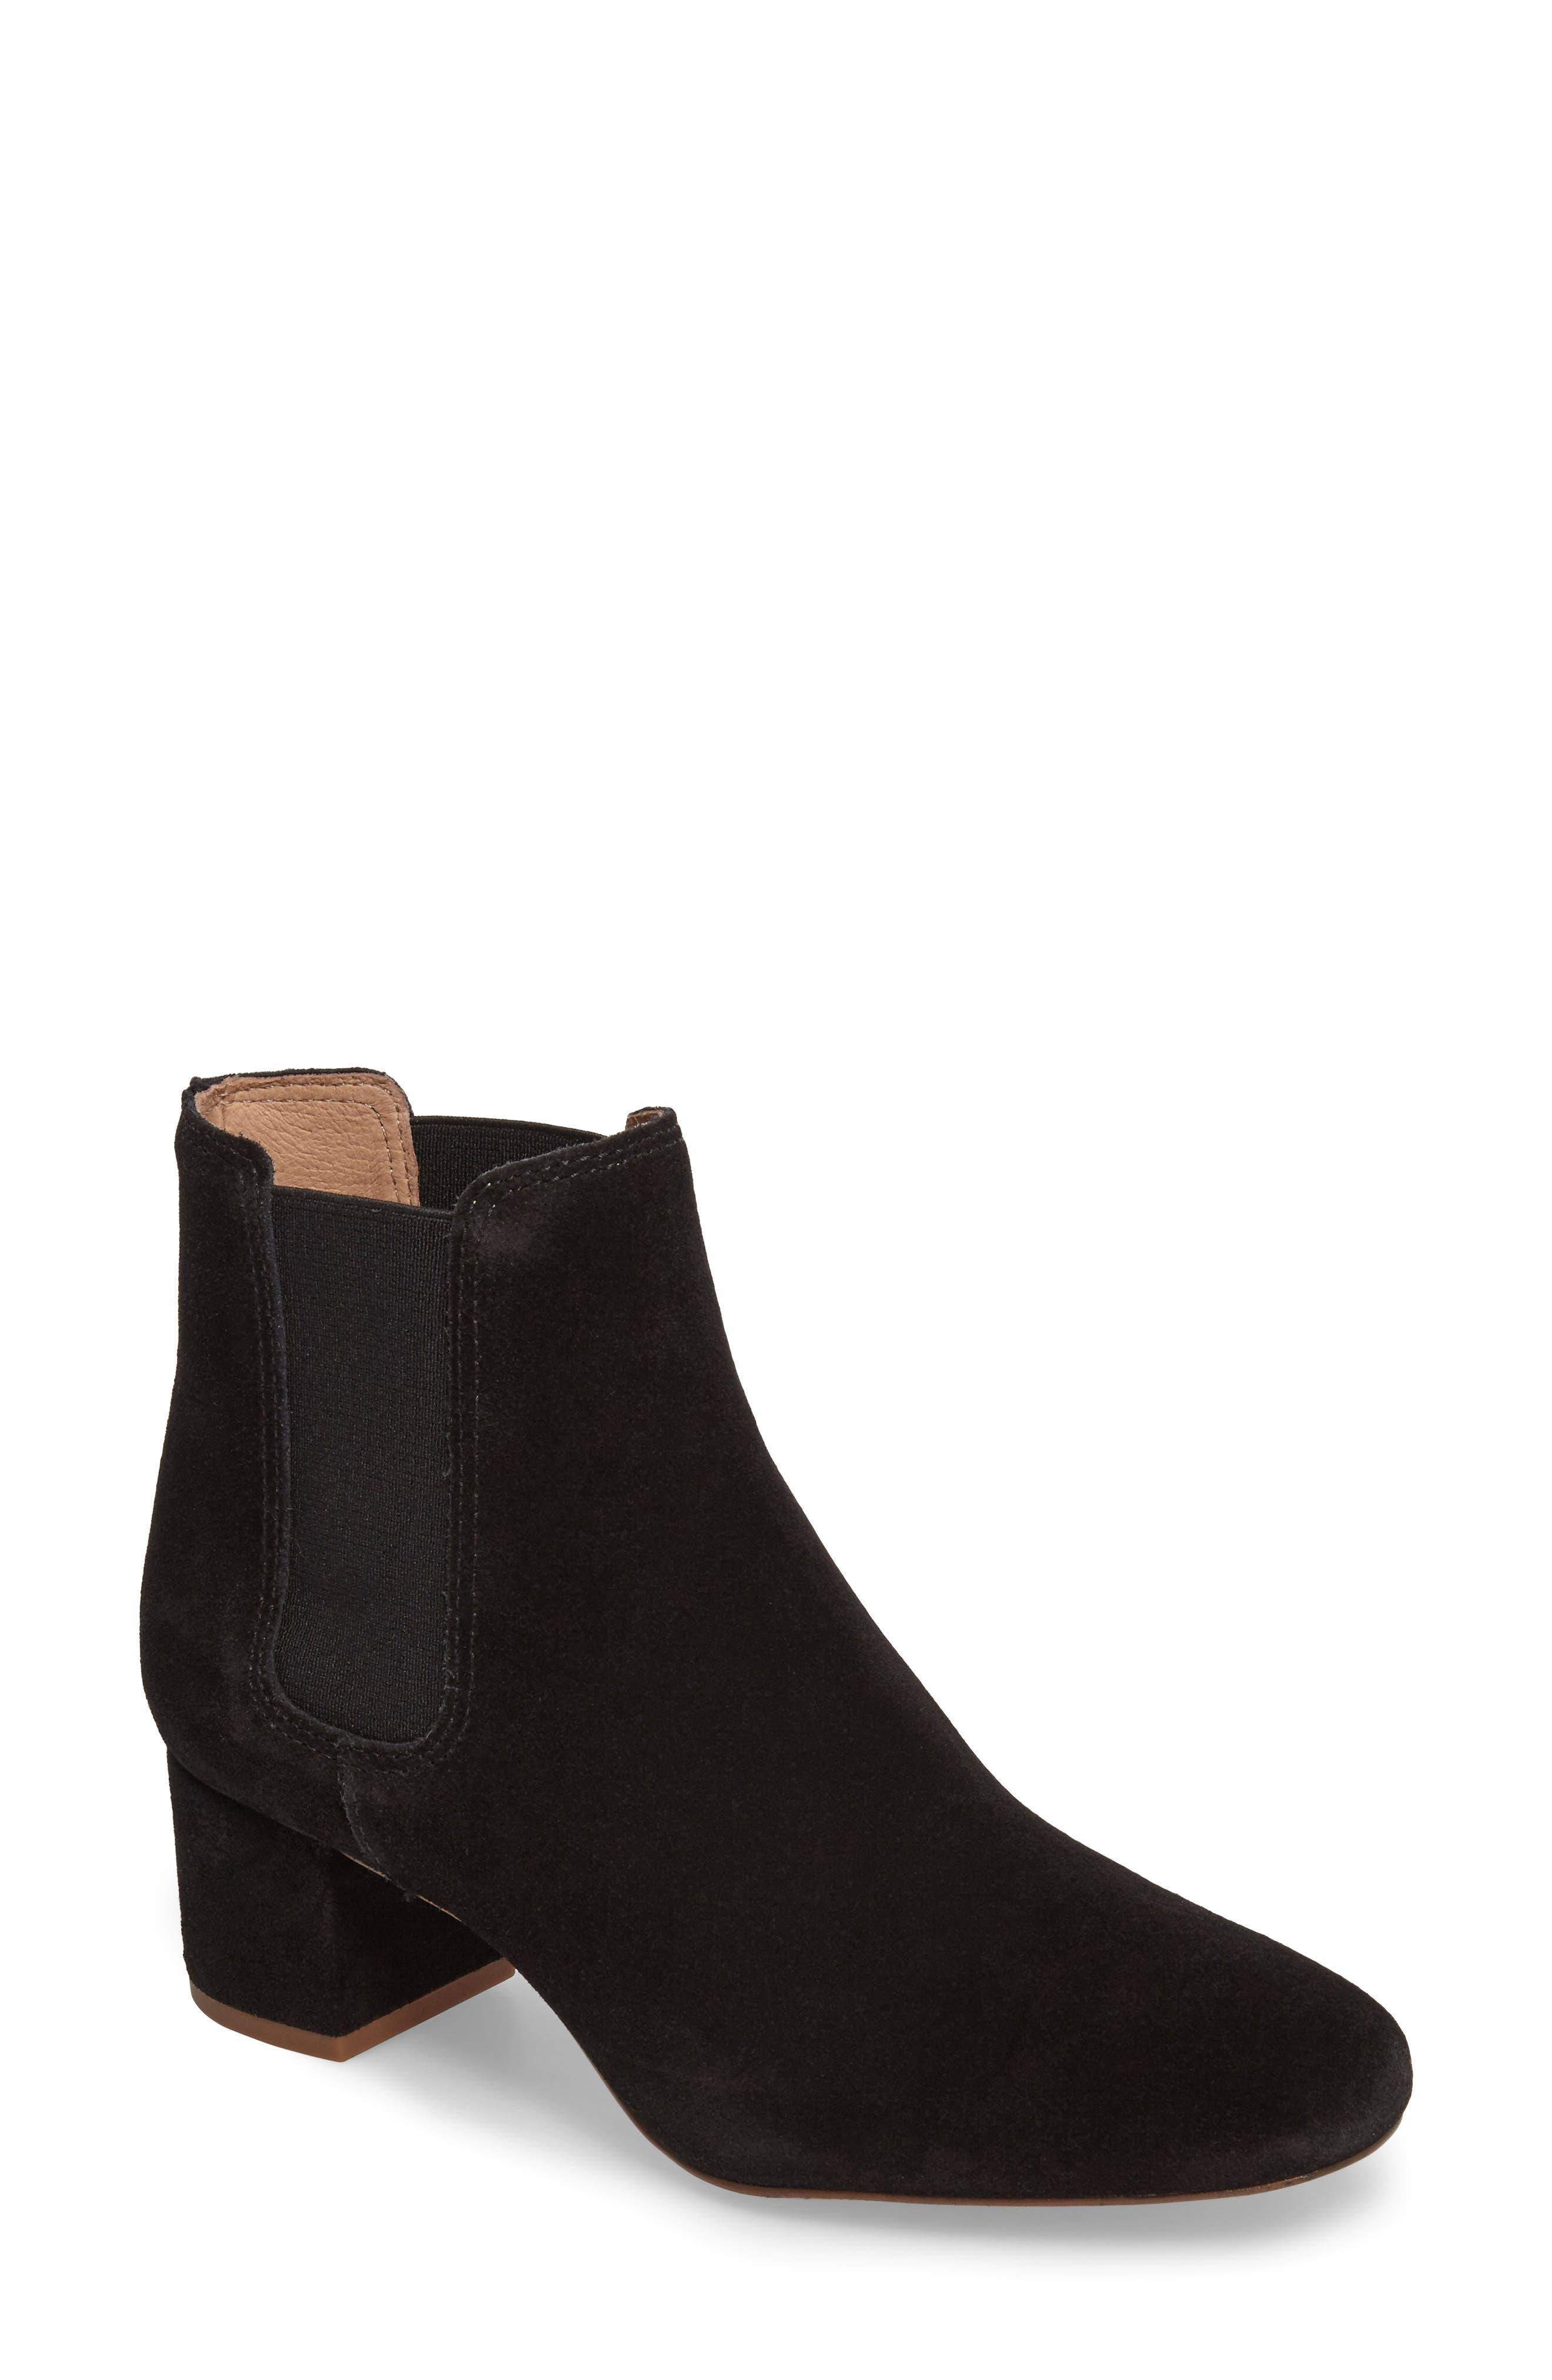 Walker Chelsea Boot,                         Main,                         color, 001